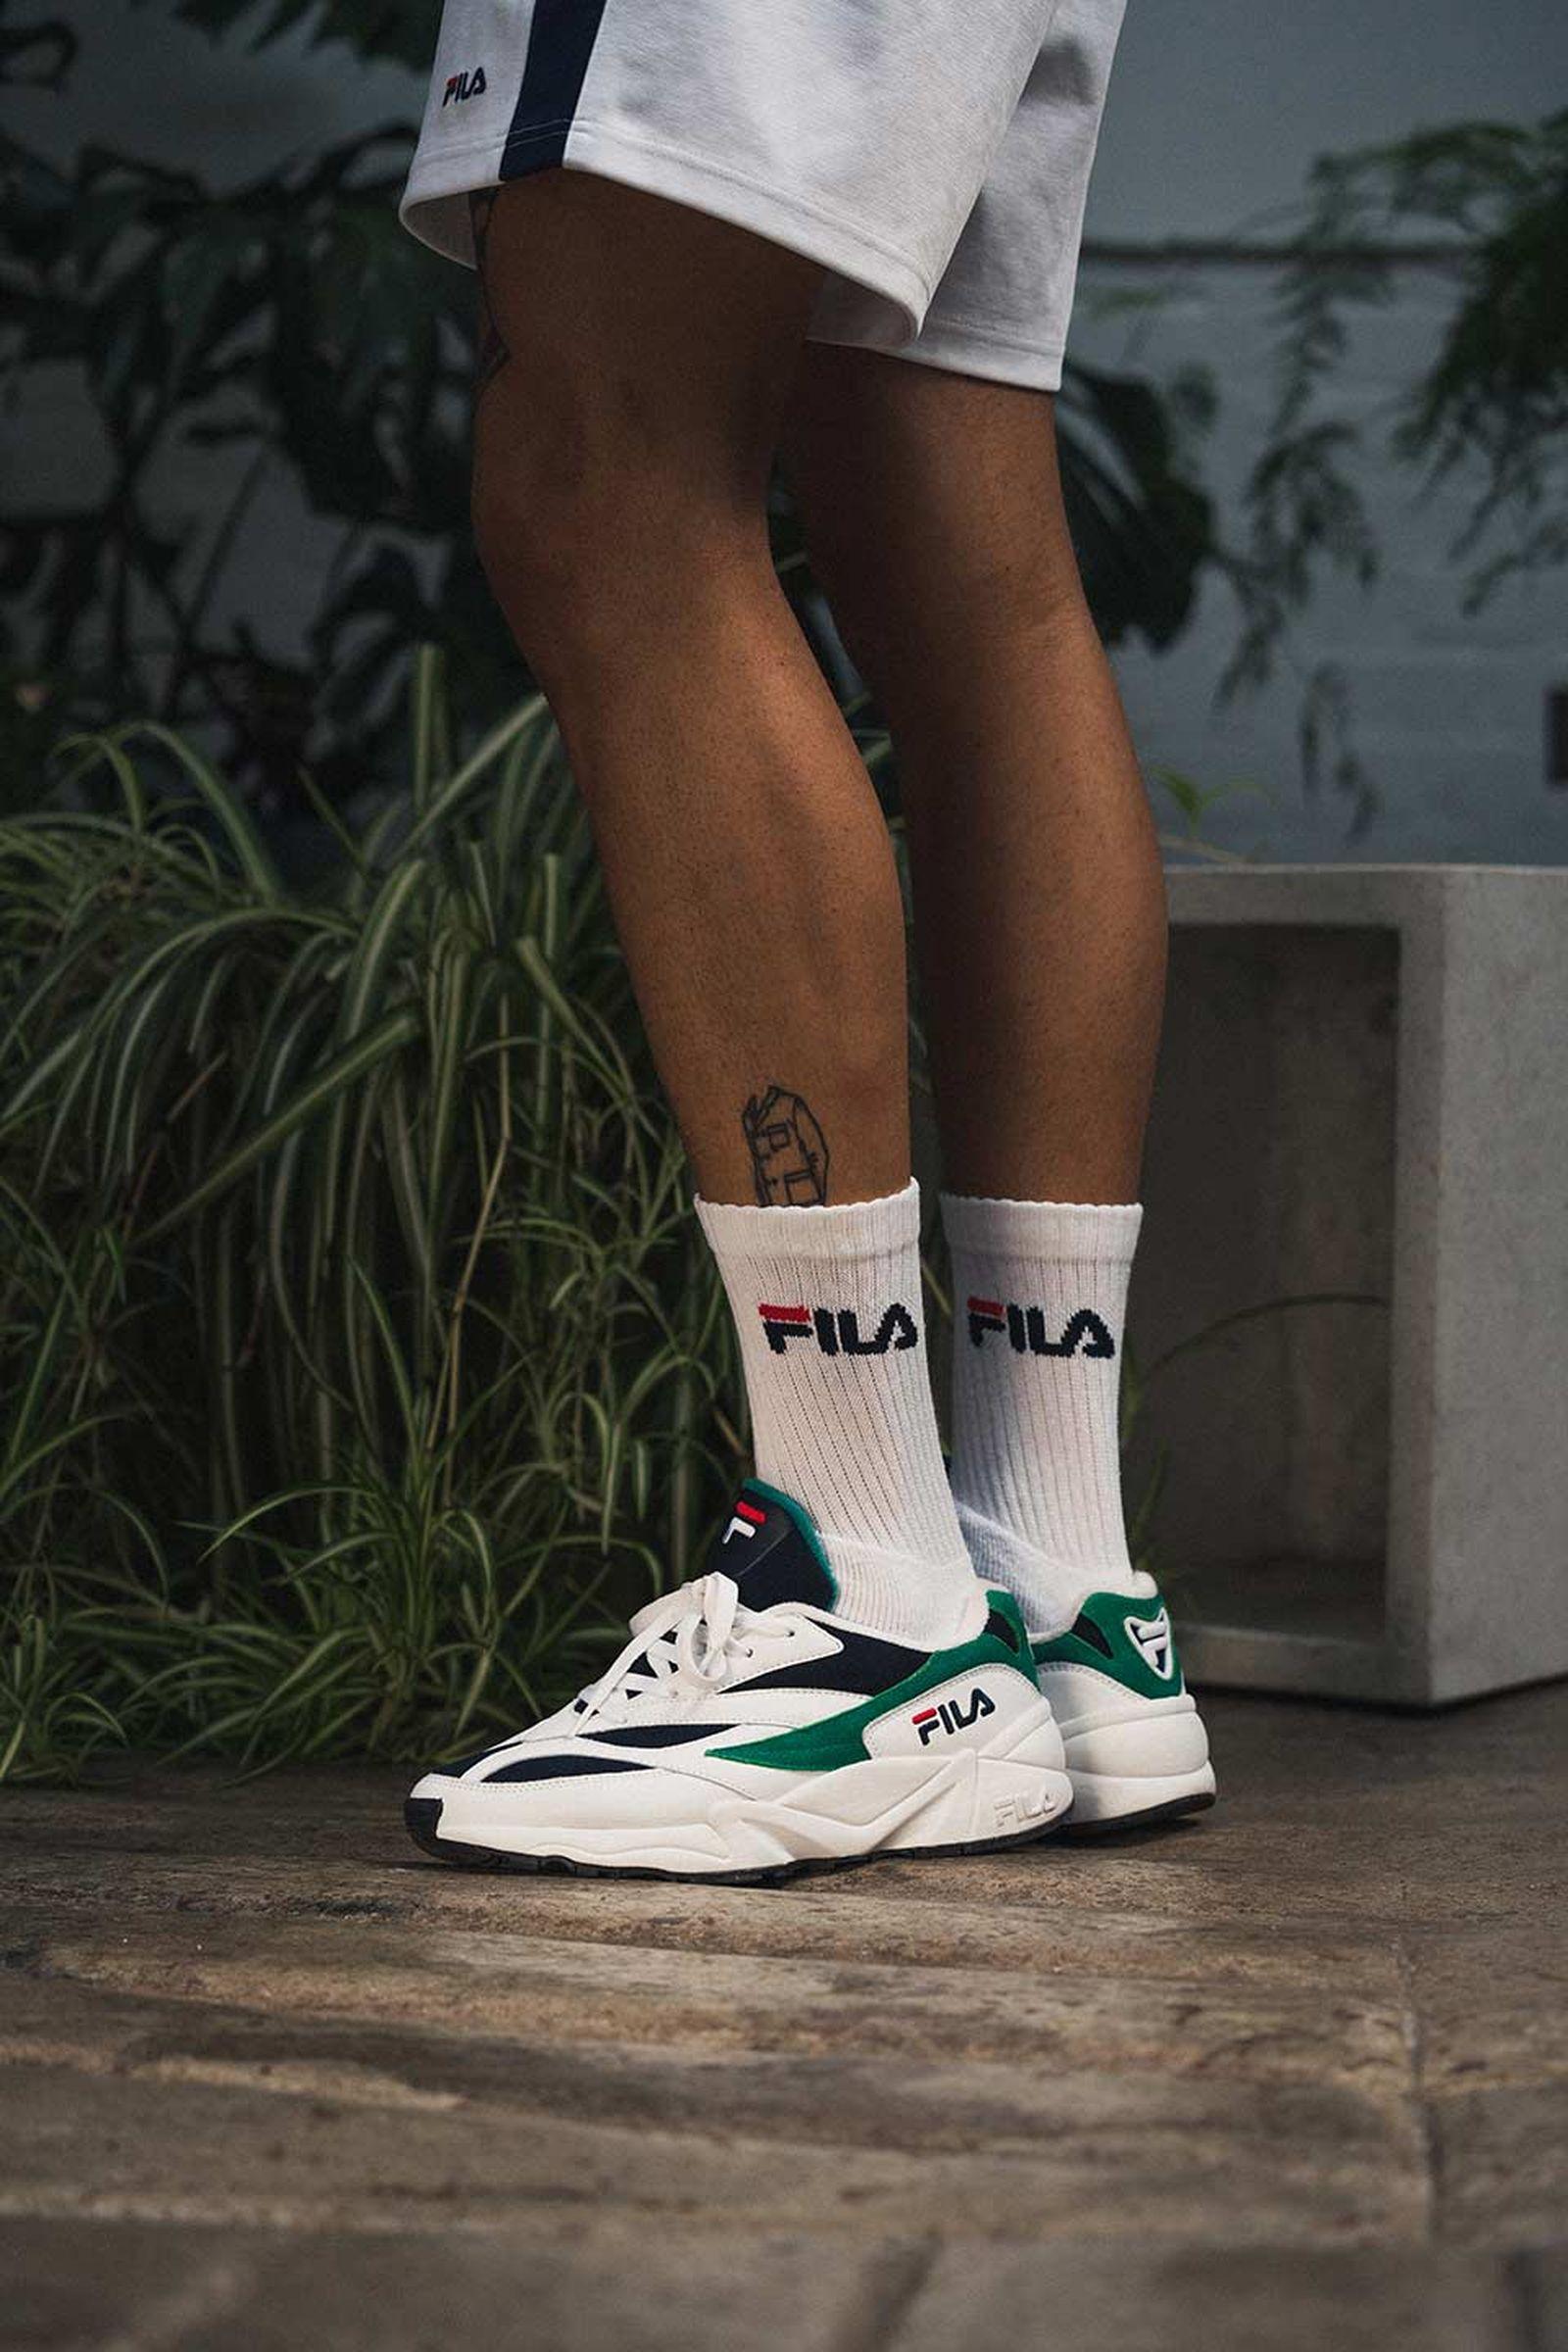 fila-venom-sneakers-release-date-price-09